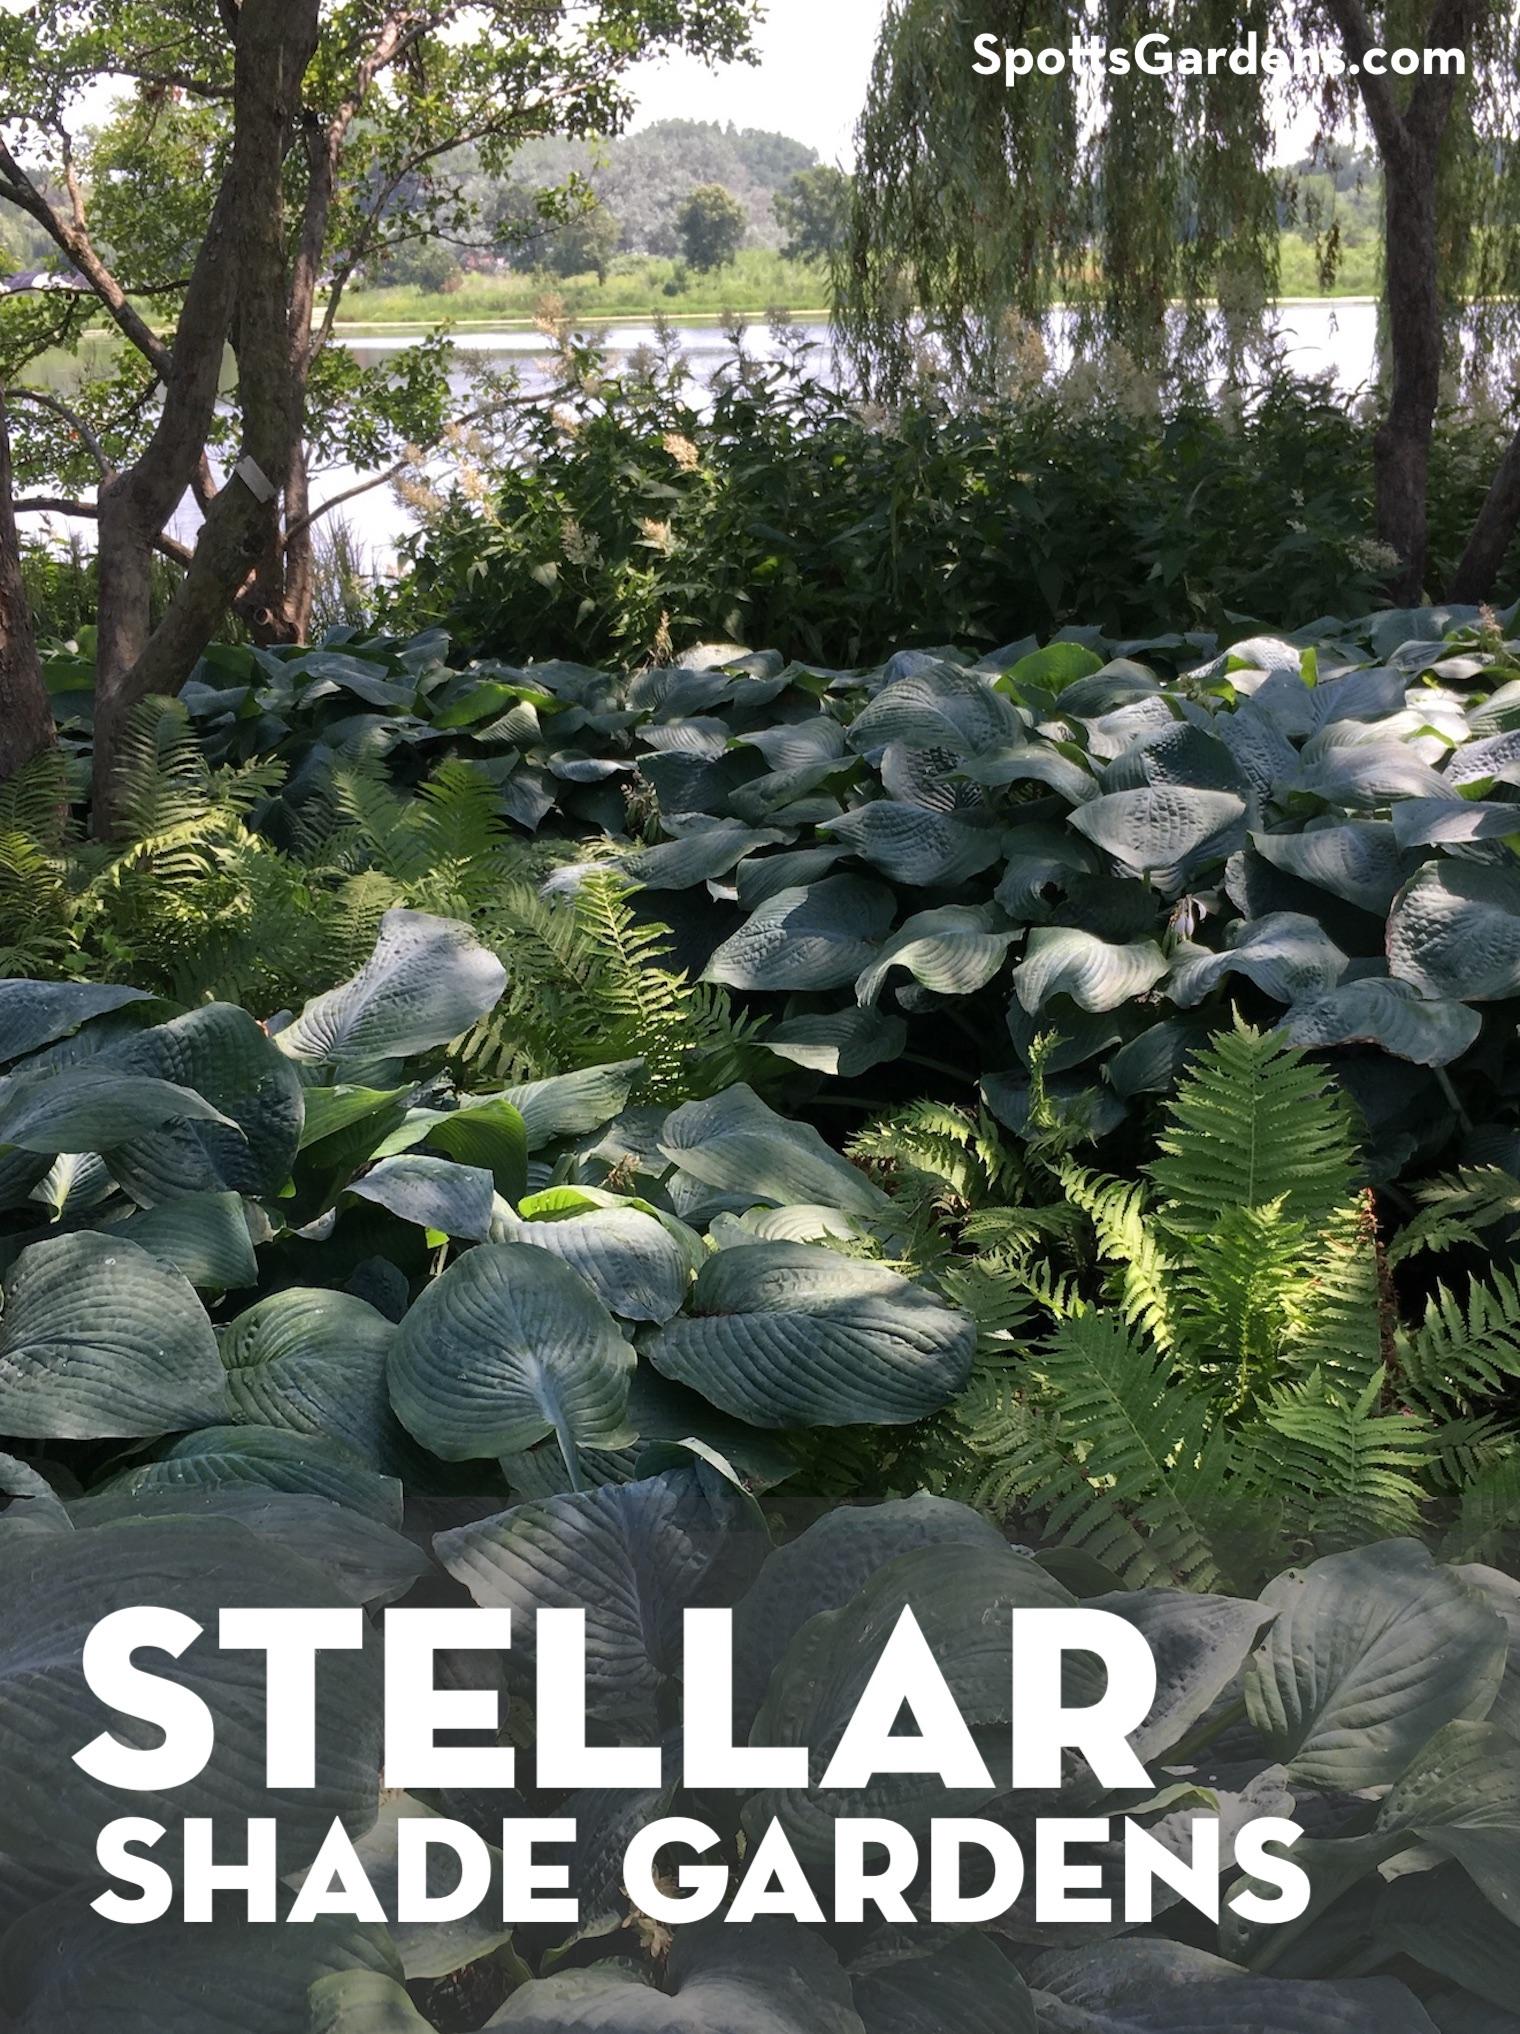 Stellar shade gardens